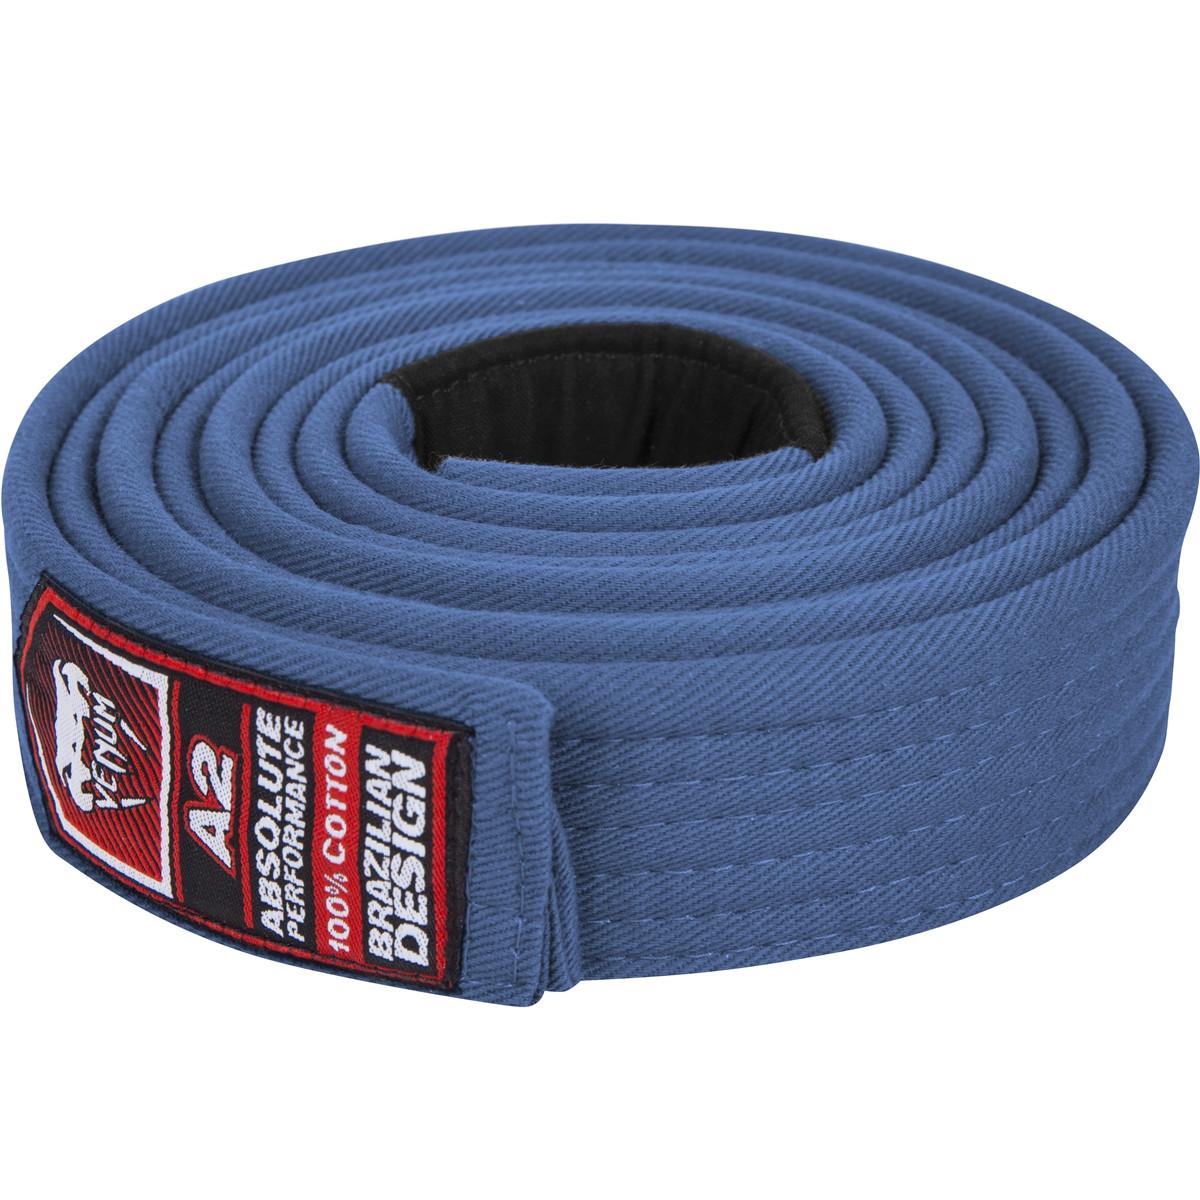 Venum Brazilian Jiu Jitsu Blue belt , All Belt colors at www.thejiujitsushop.com   Enjoy Free shipping on Venum BJJ Belts today from The Jiu Jitsu Shop